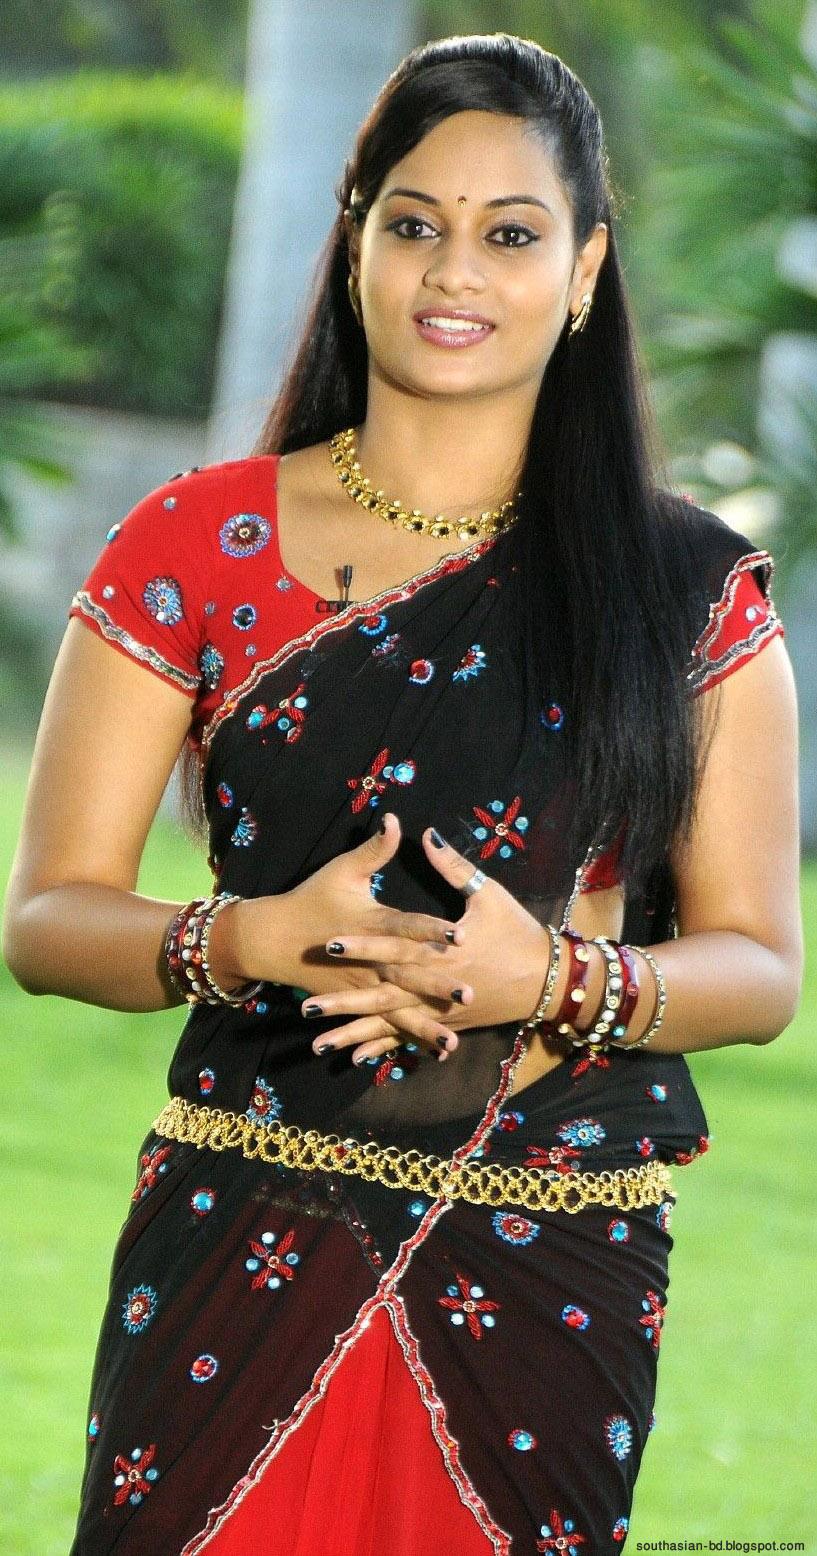 Sithi Tamil Kamakathaikal in Tamil Language ~ tamil kama